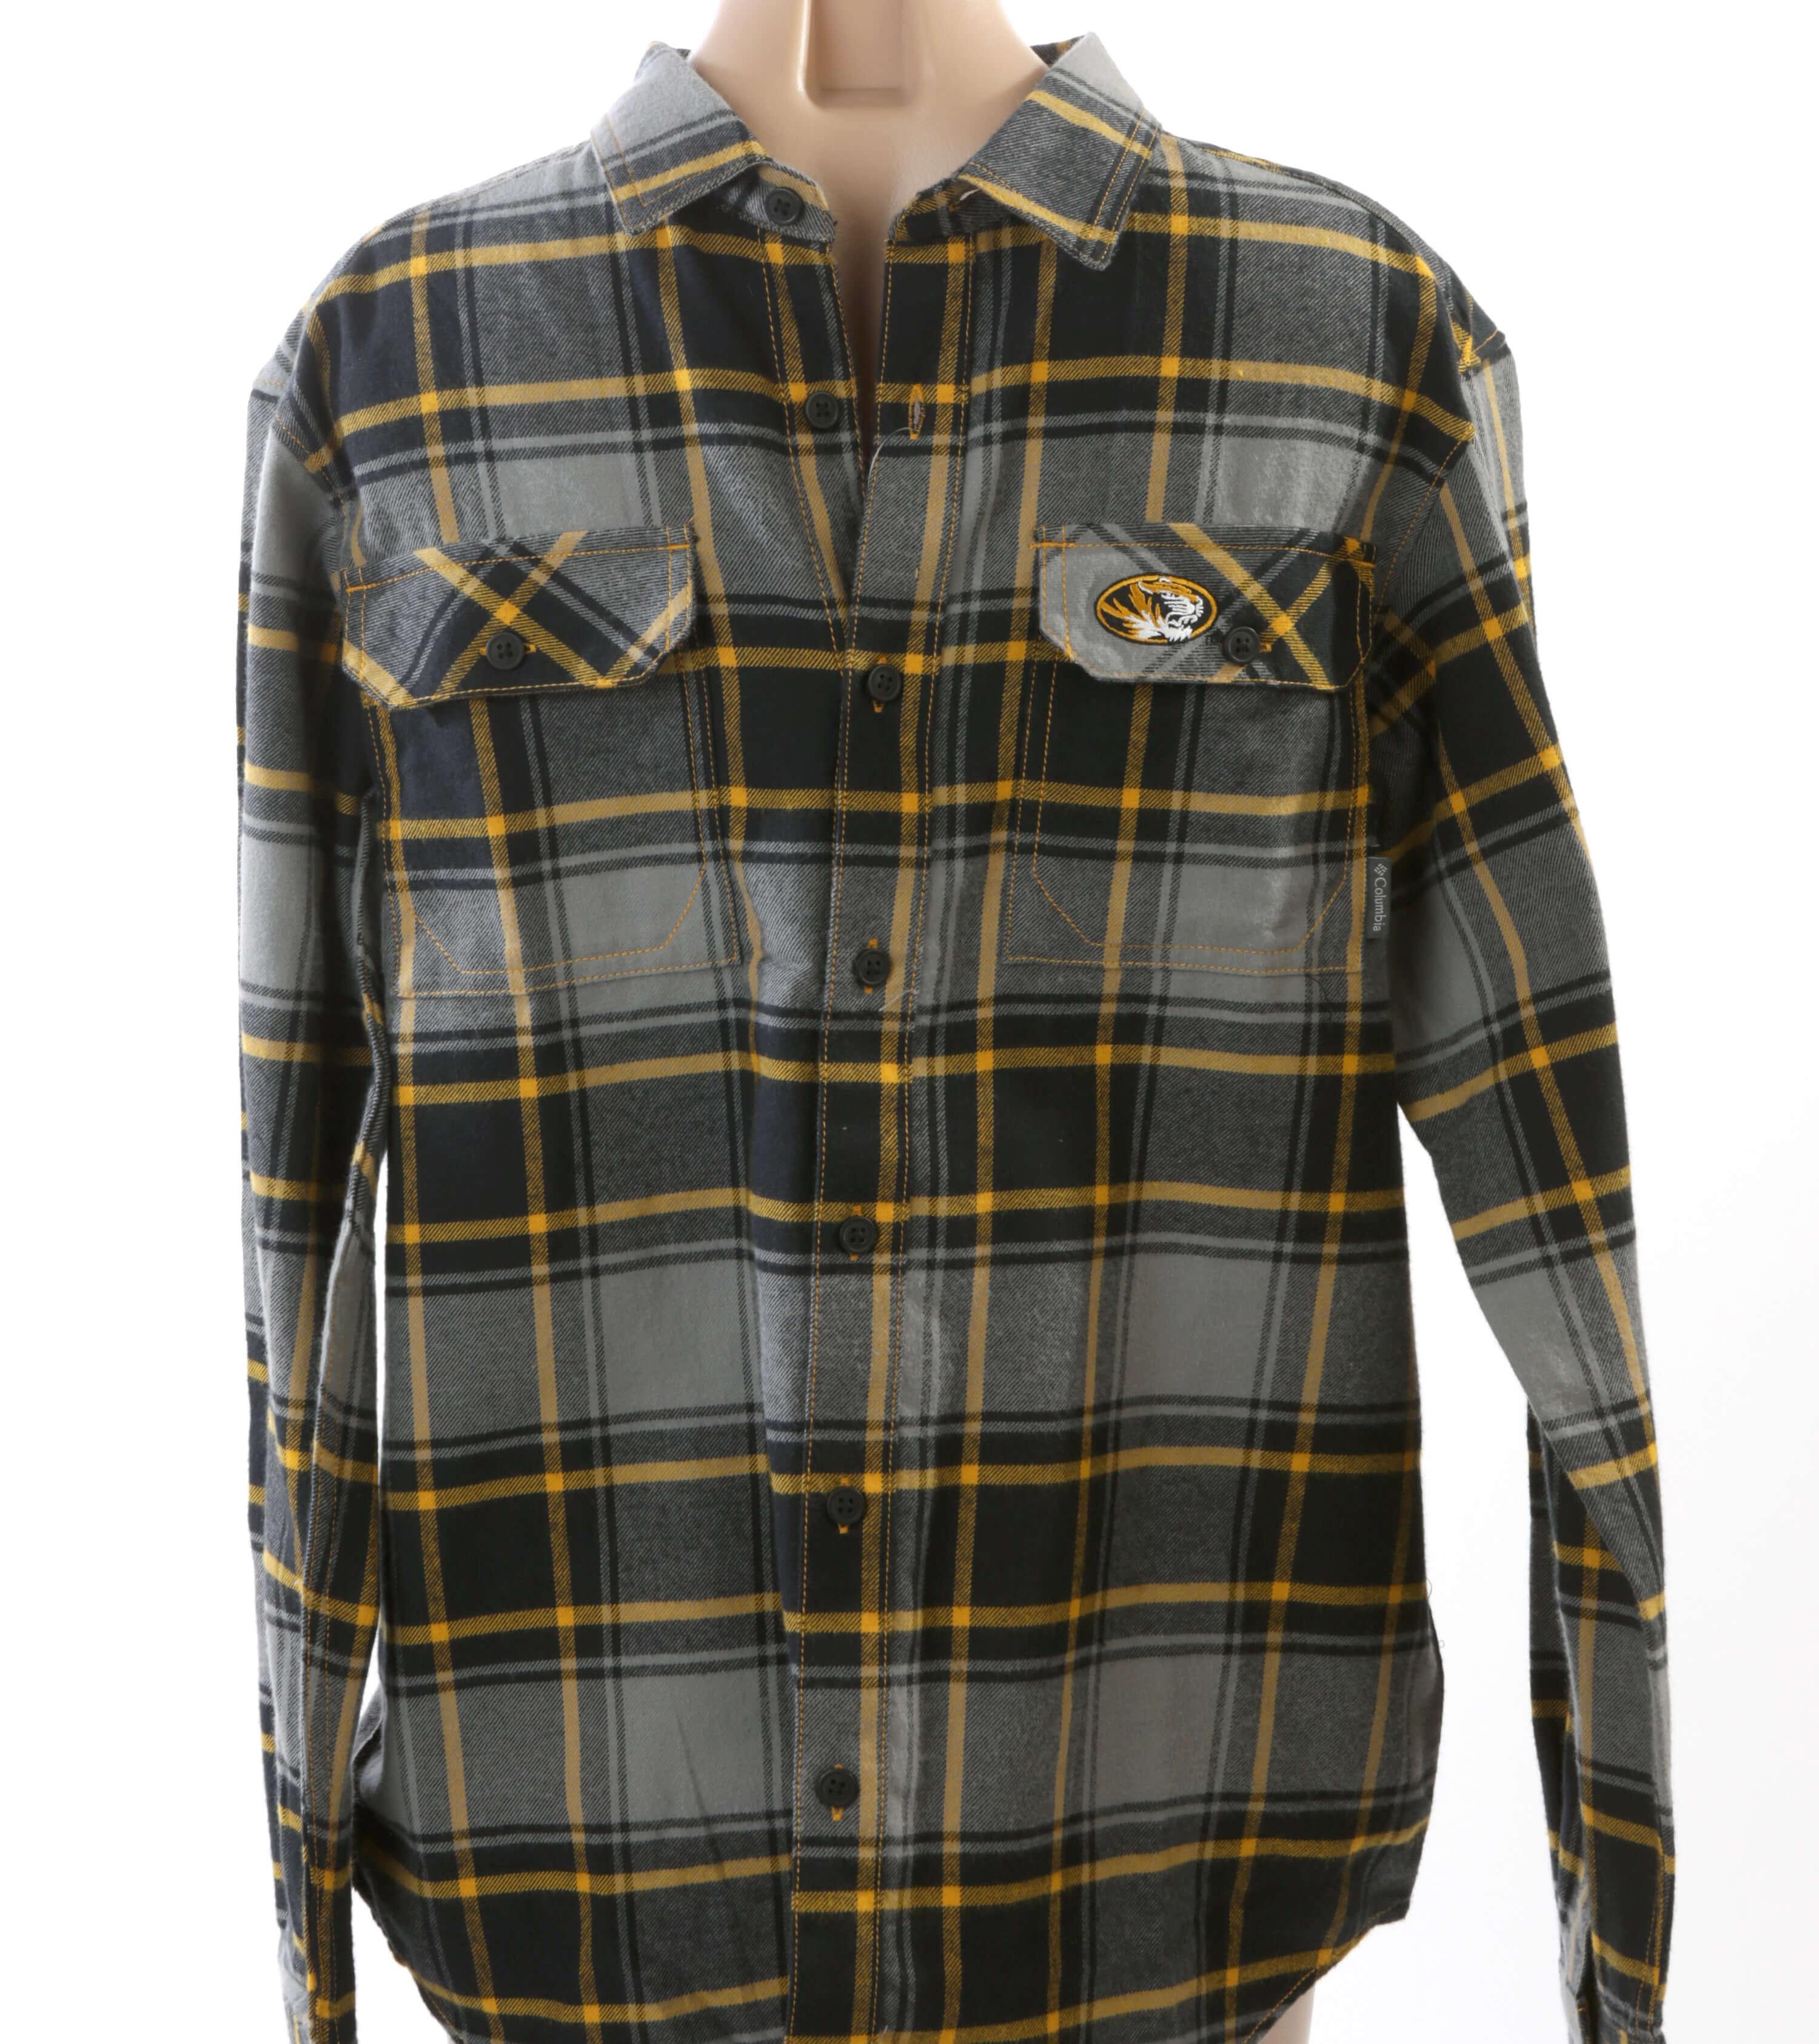 Mizzou men's flannel shirt